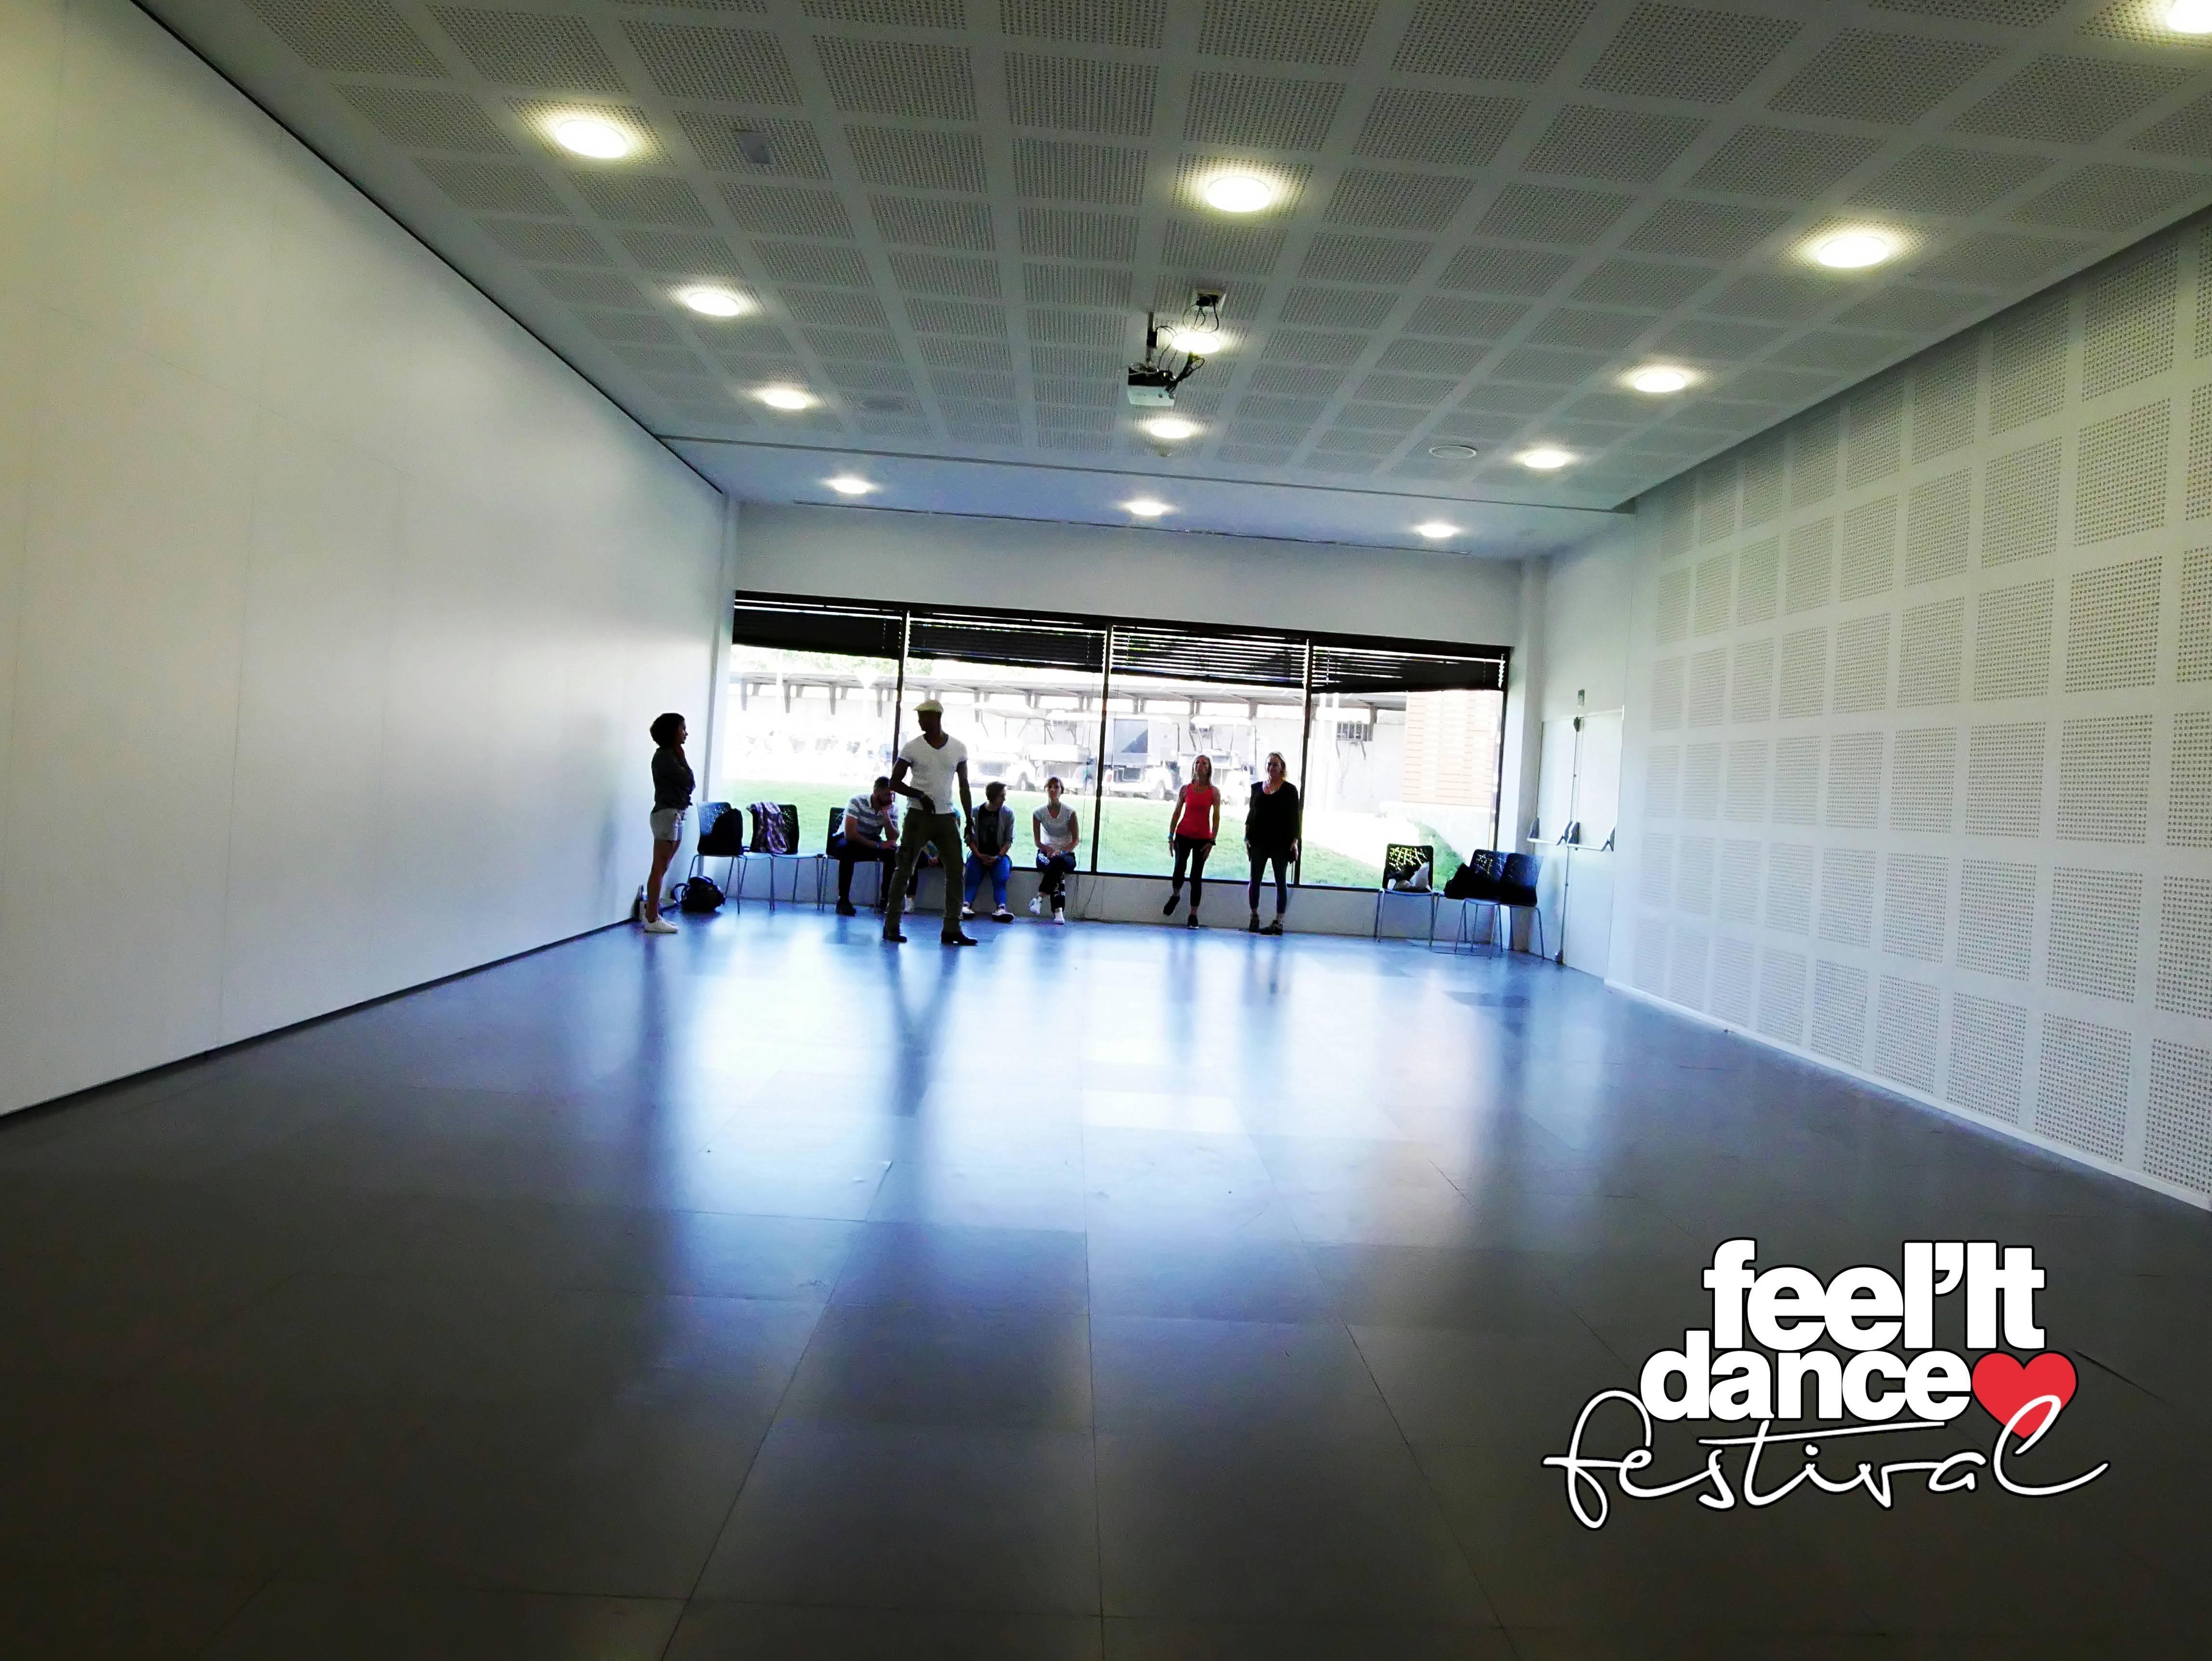 FeelitDanceFestival - 016